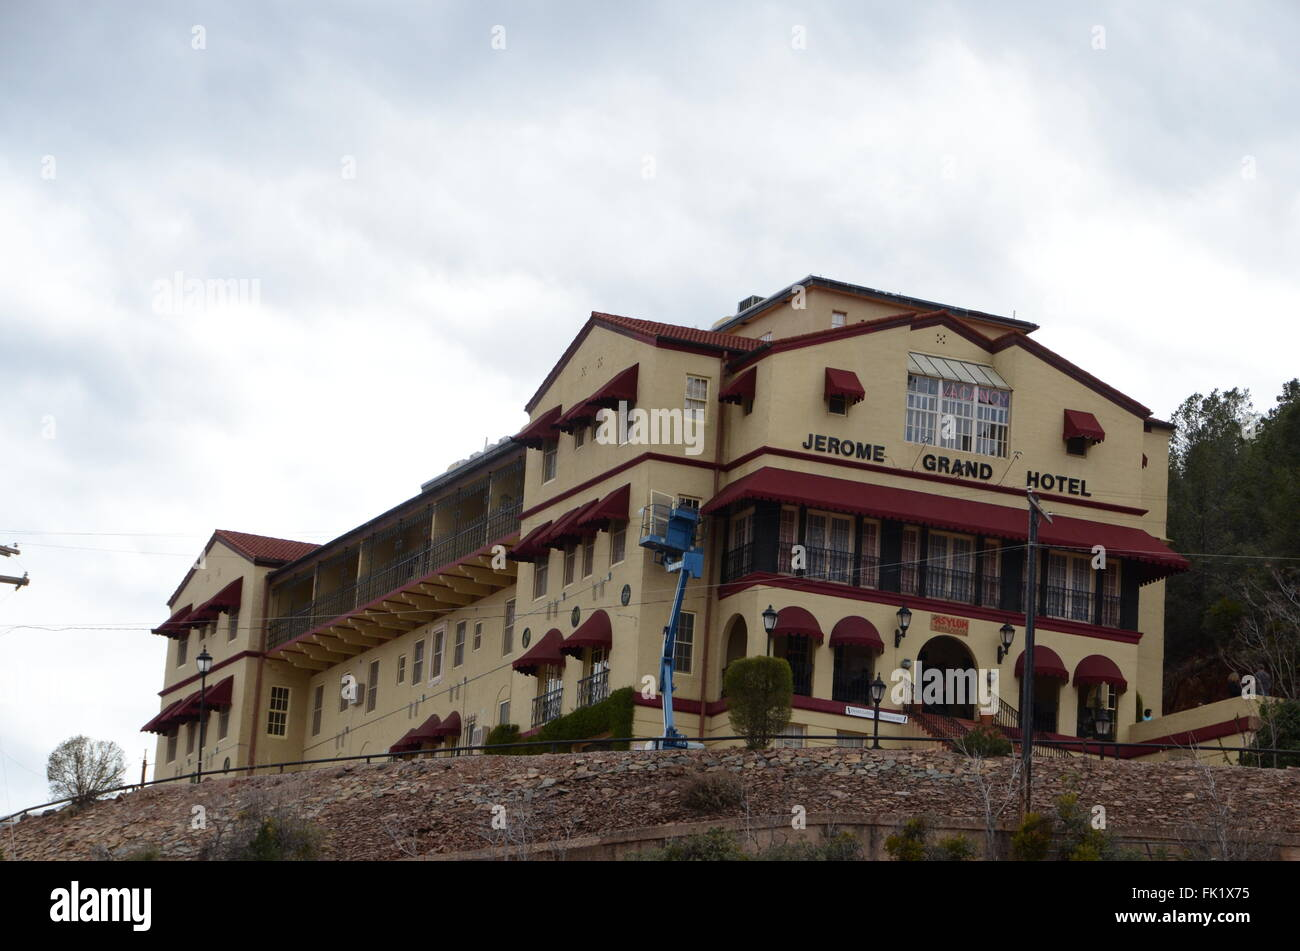 jerome grand hotel arizona haunted ex mental asylum - Stock Image